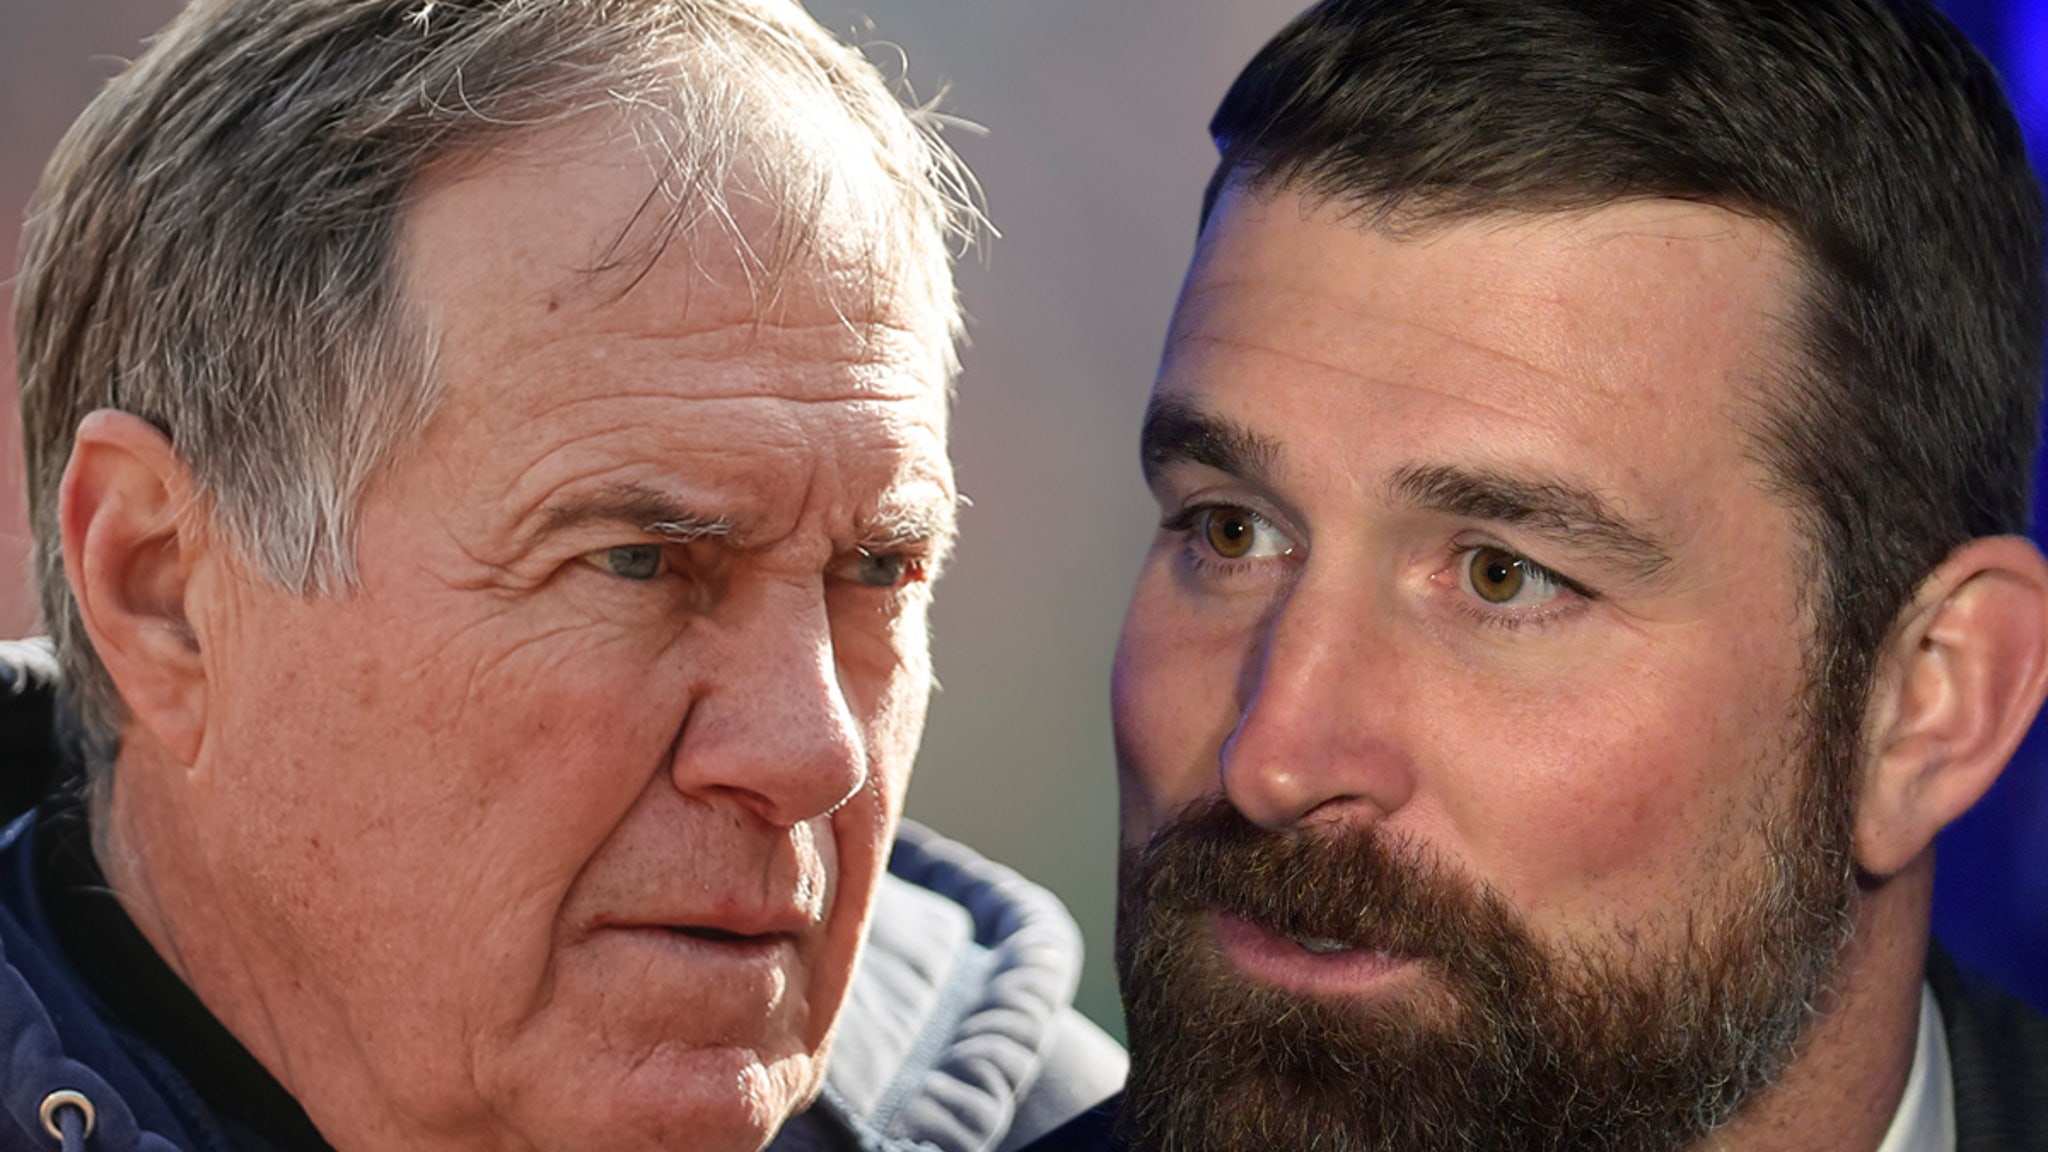 Bill Belichick Thinks '20 NFL Season Is a 'Joke' Due to COVID ... Ex-Pats Lineman Says